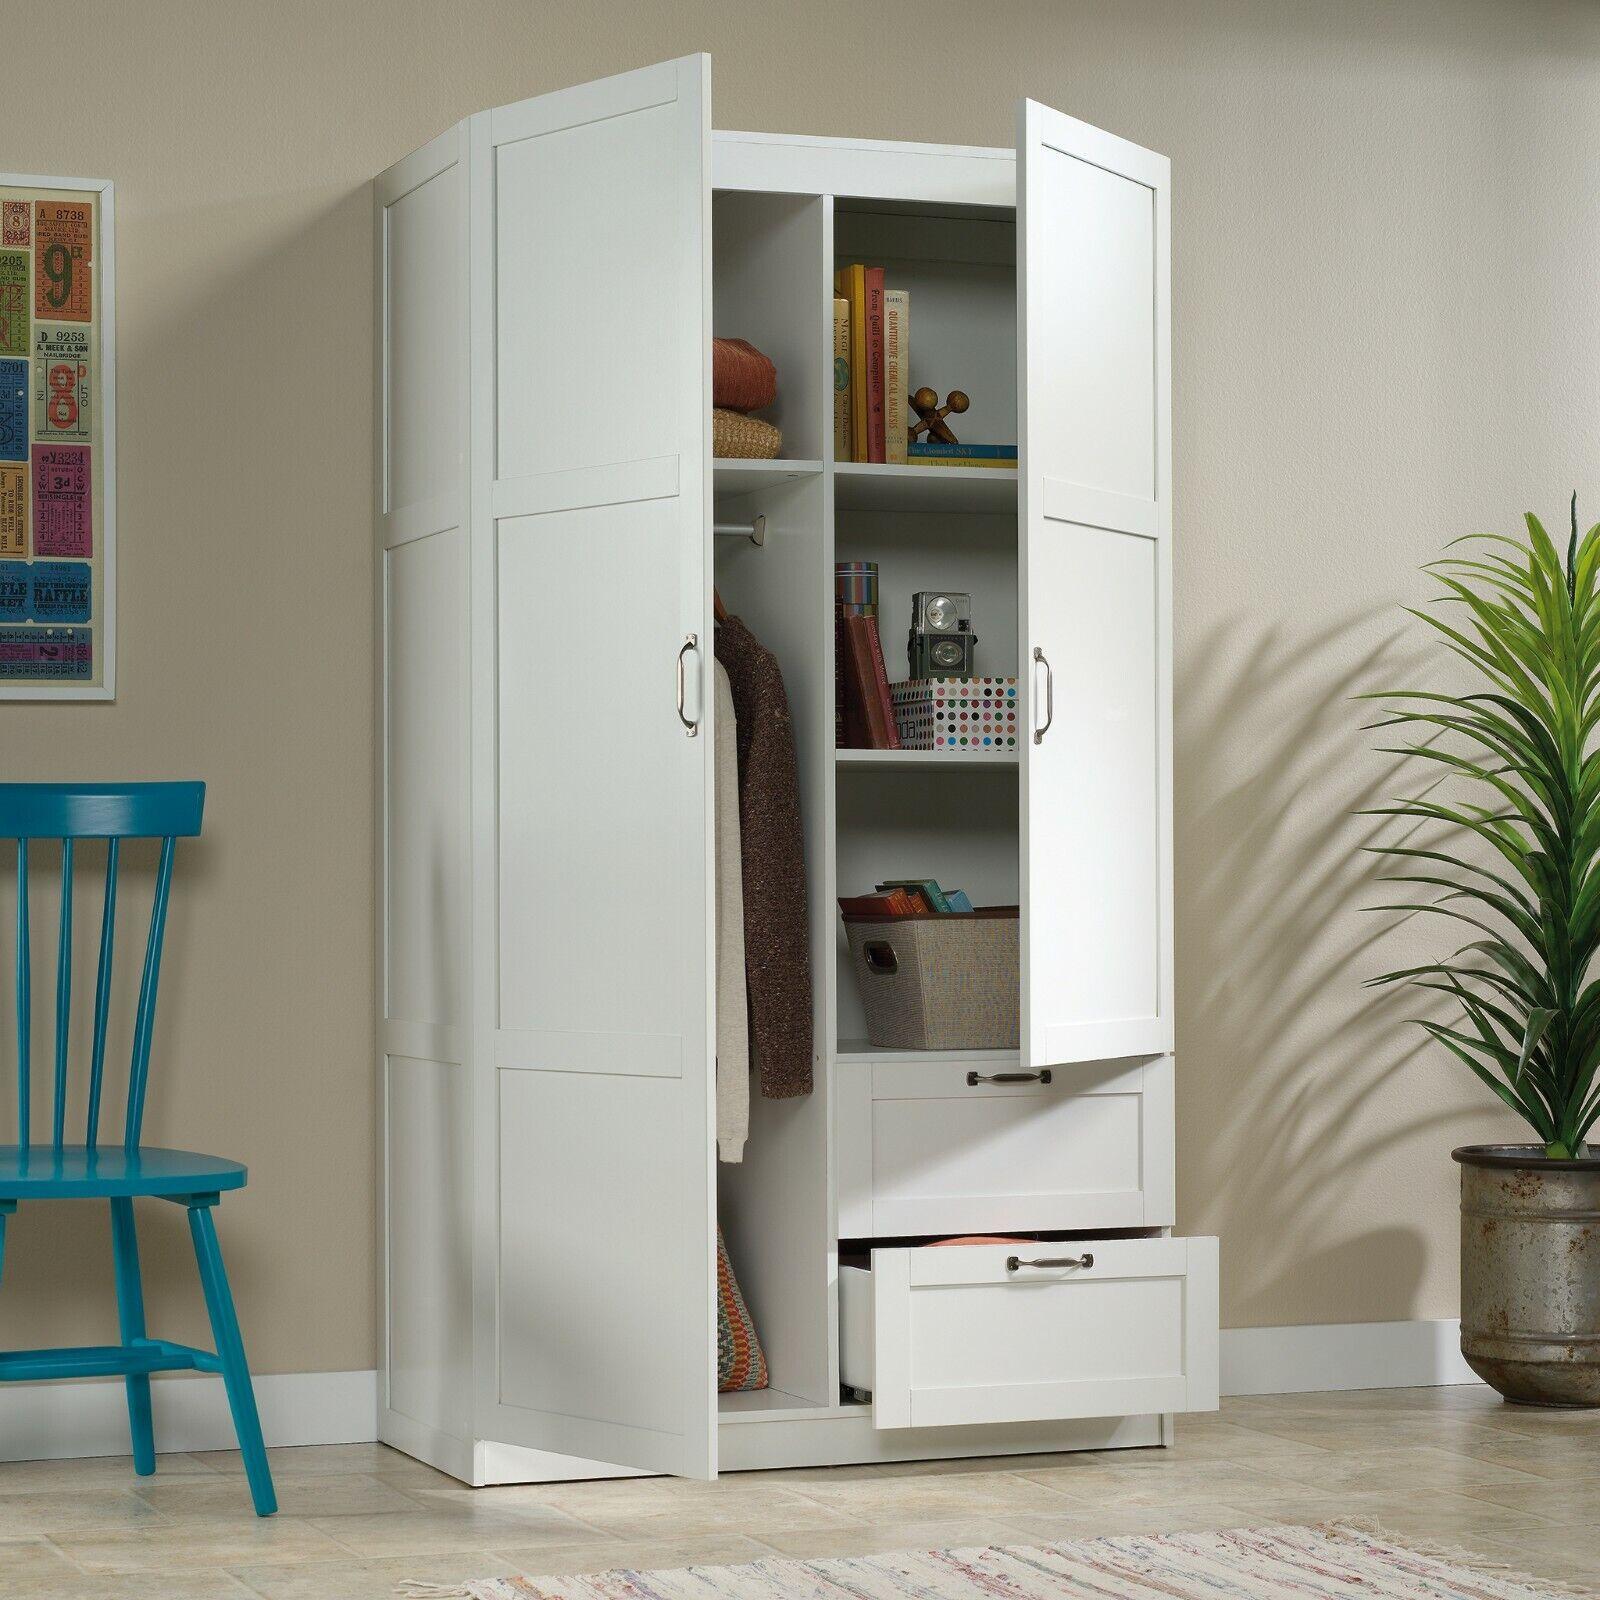 Large White Armoire Wardrobe Storage Closet With Drawers ...